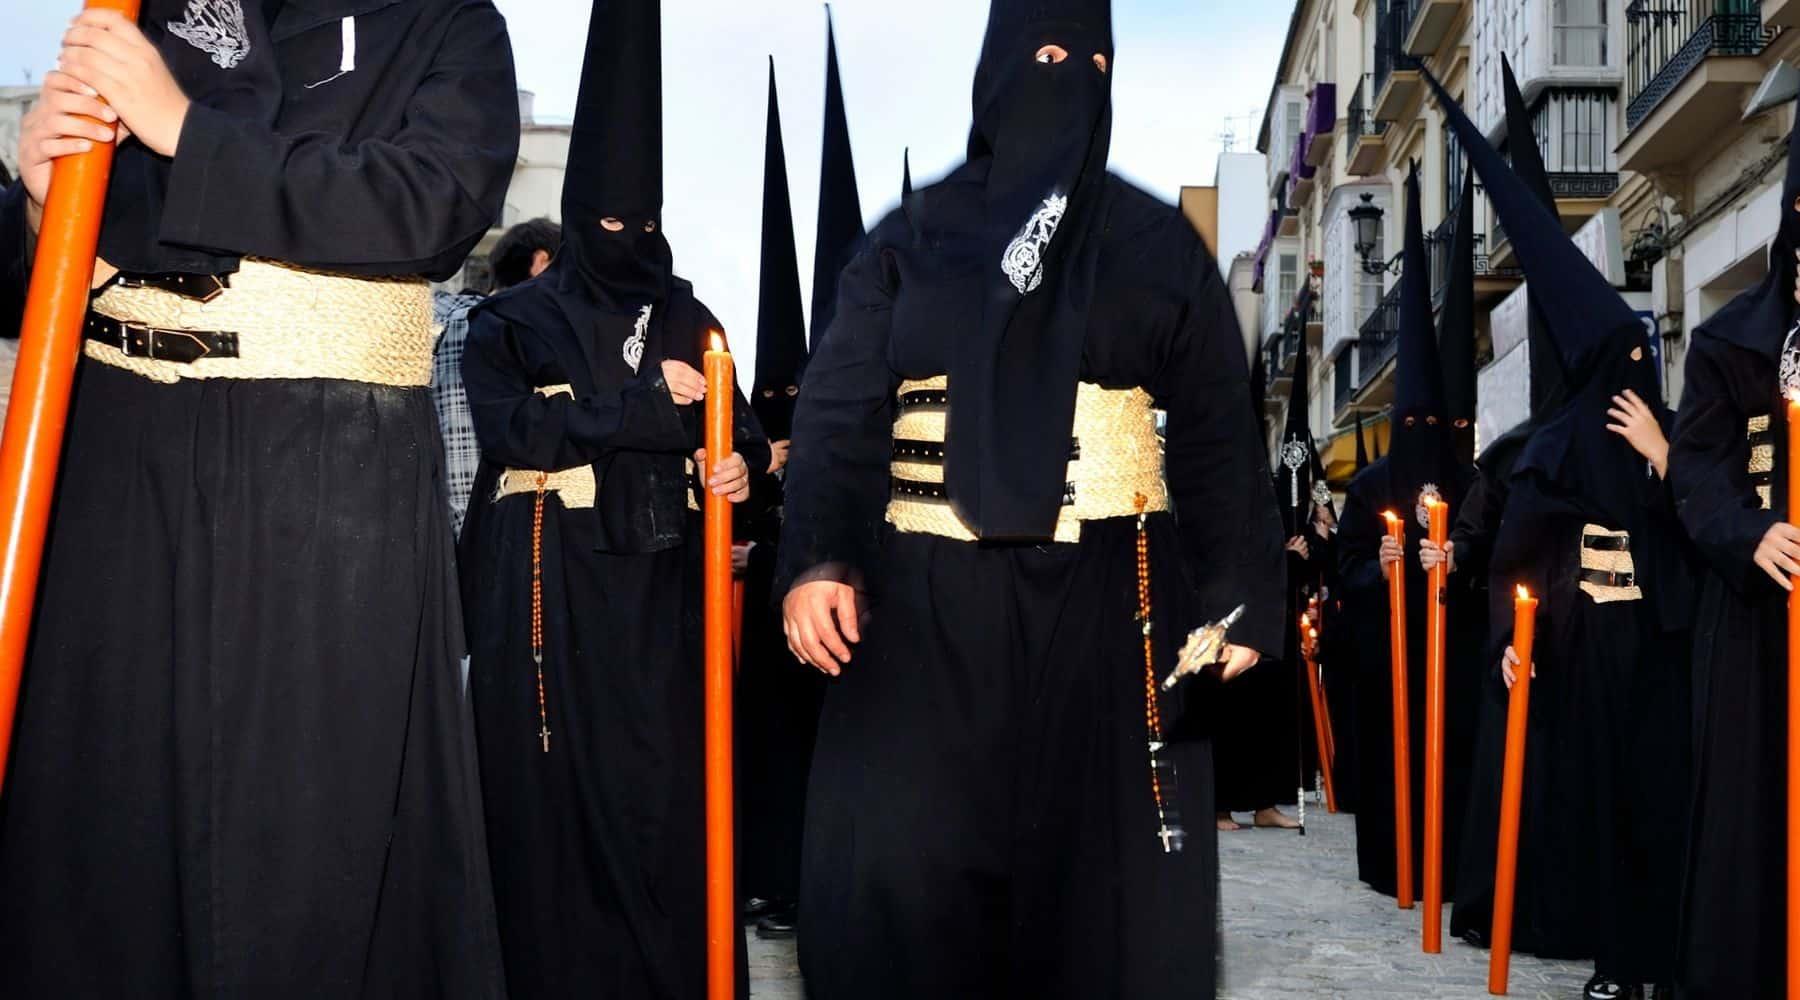 Spain - Seville - Holy Week - Semana Santa - Black cloaked Nazarenos